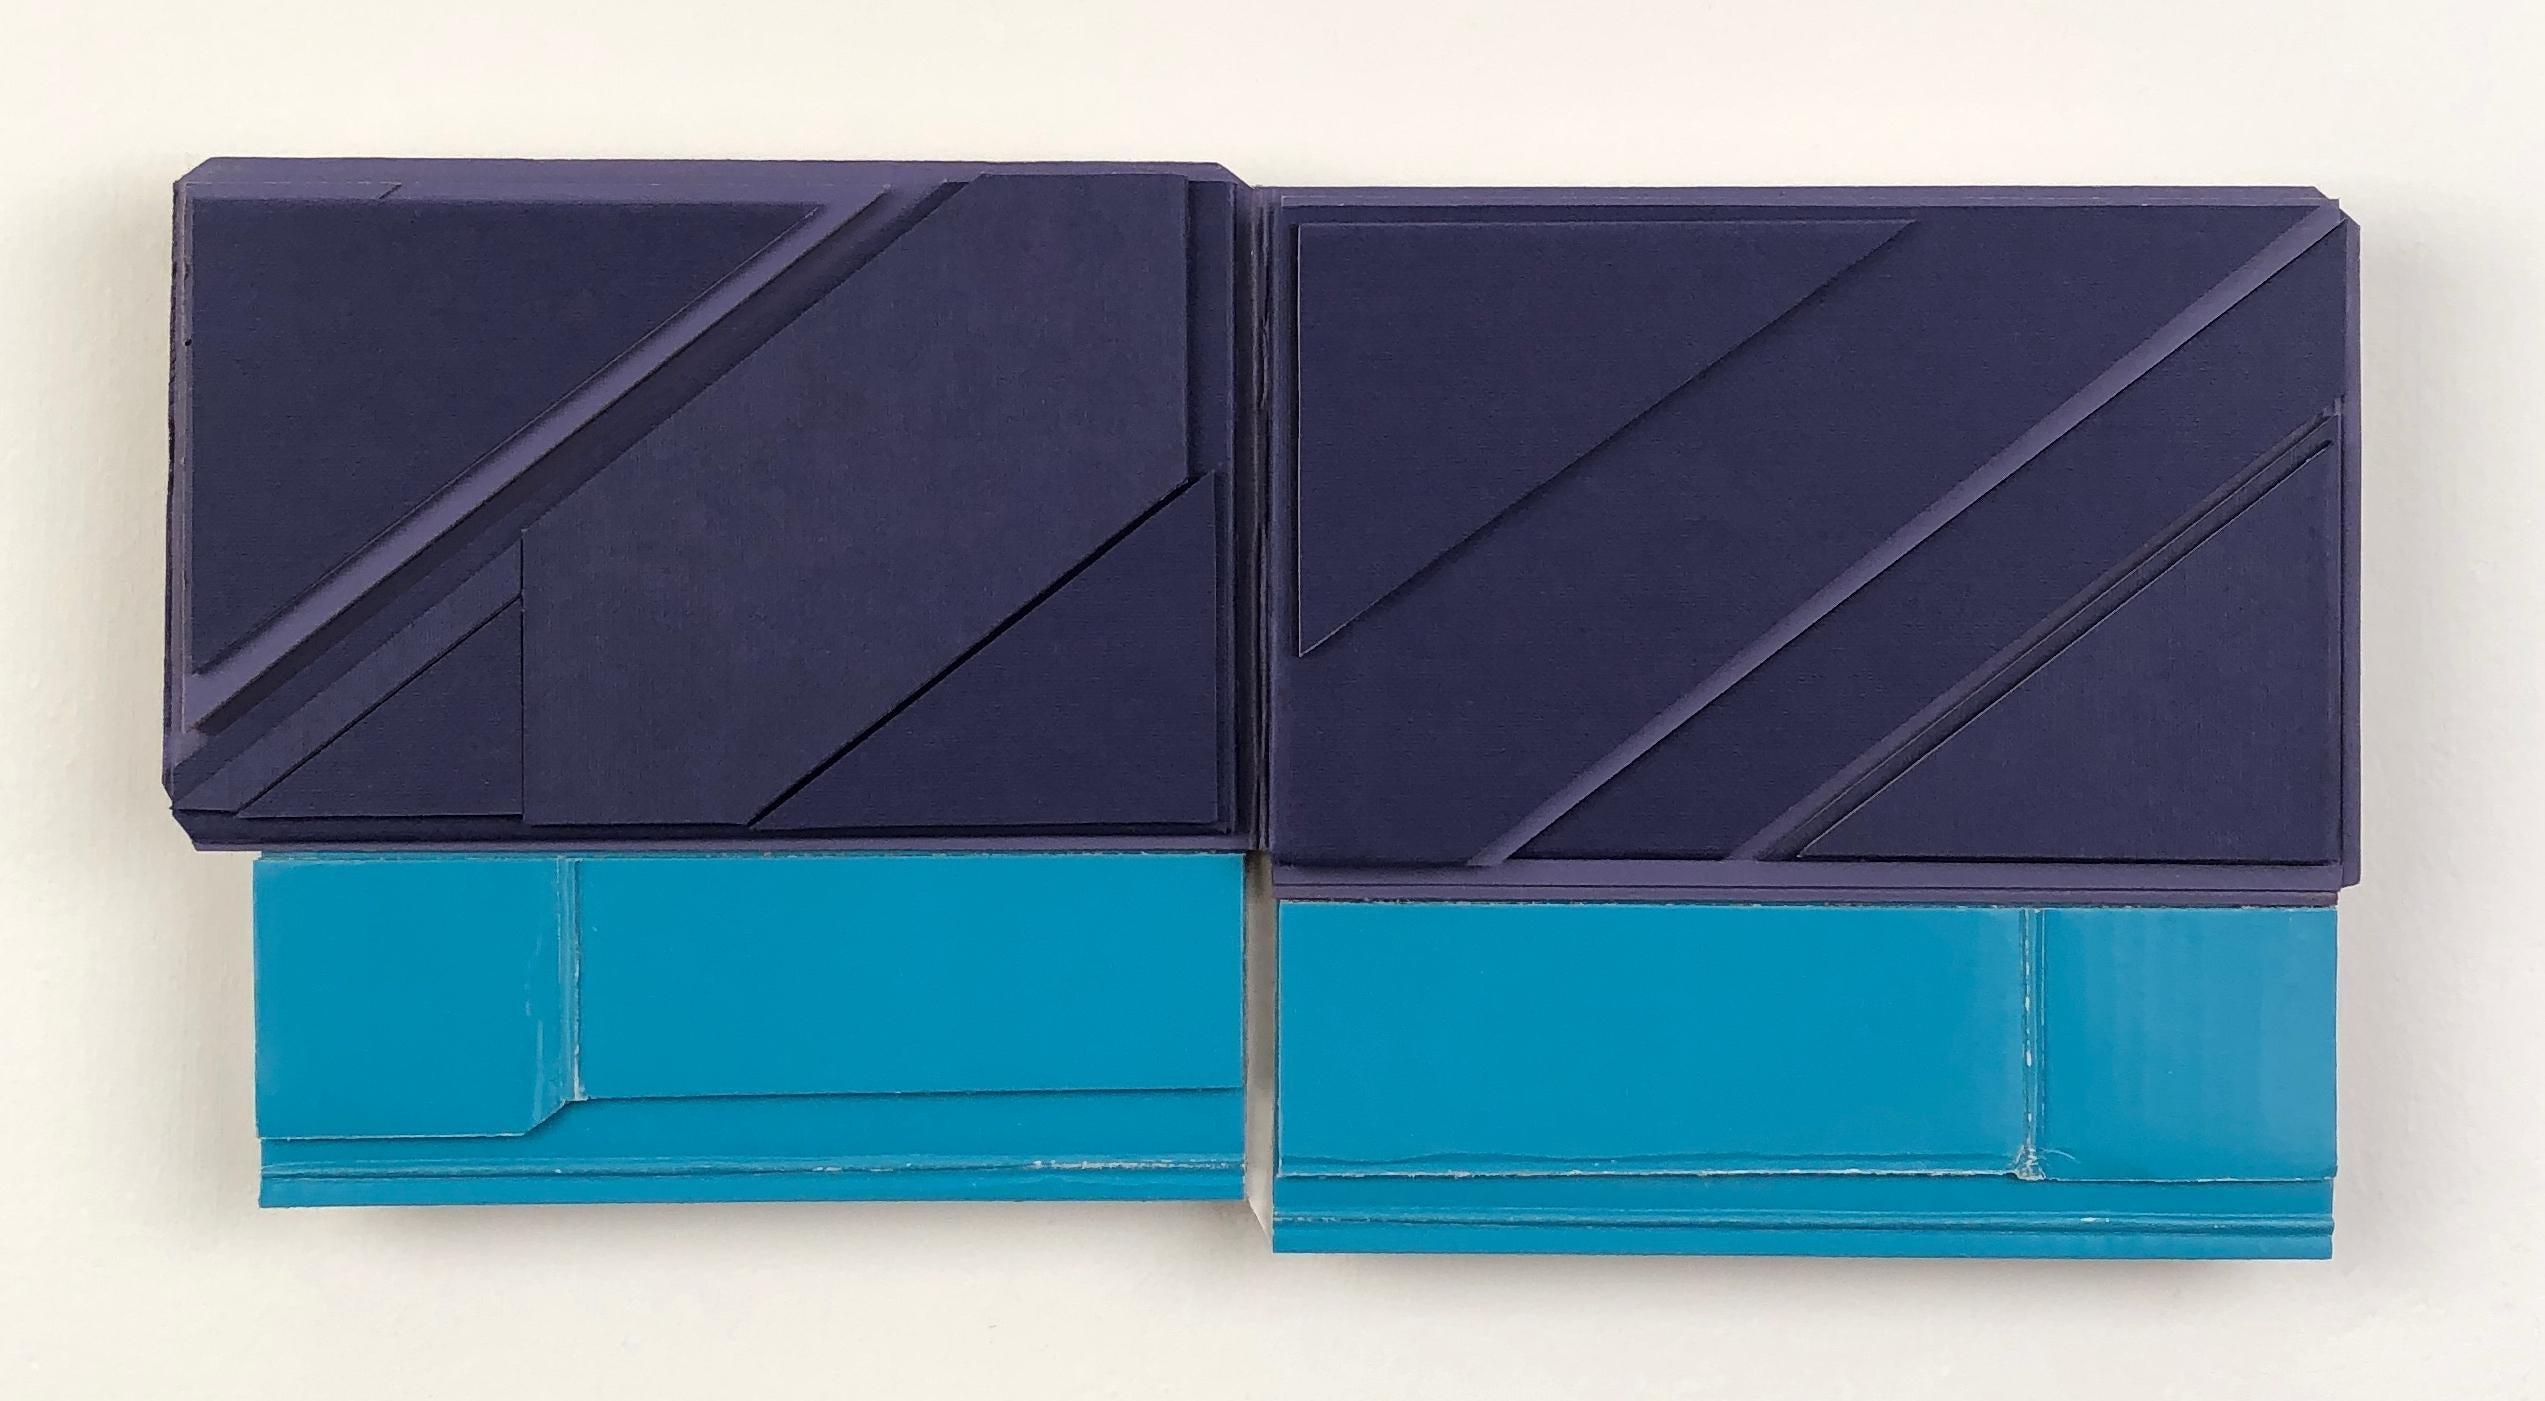 Ryan Sarah Murphy,  Each, 2019, found (unpainted) cardboard, foamcore, 6 x 12 in